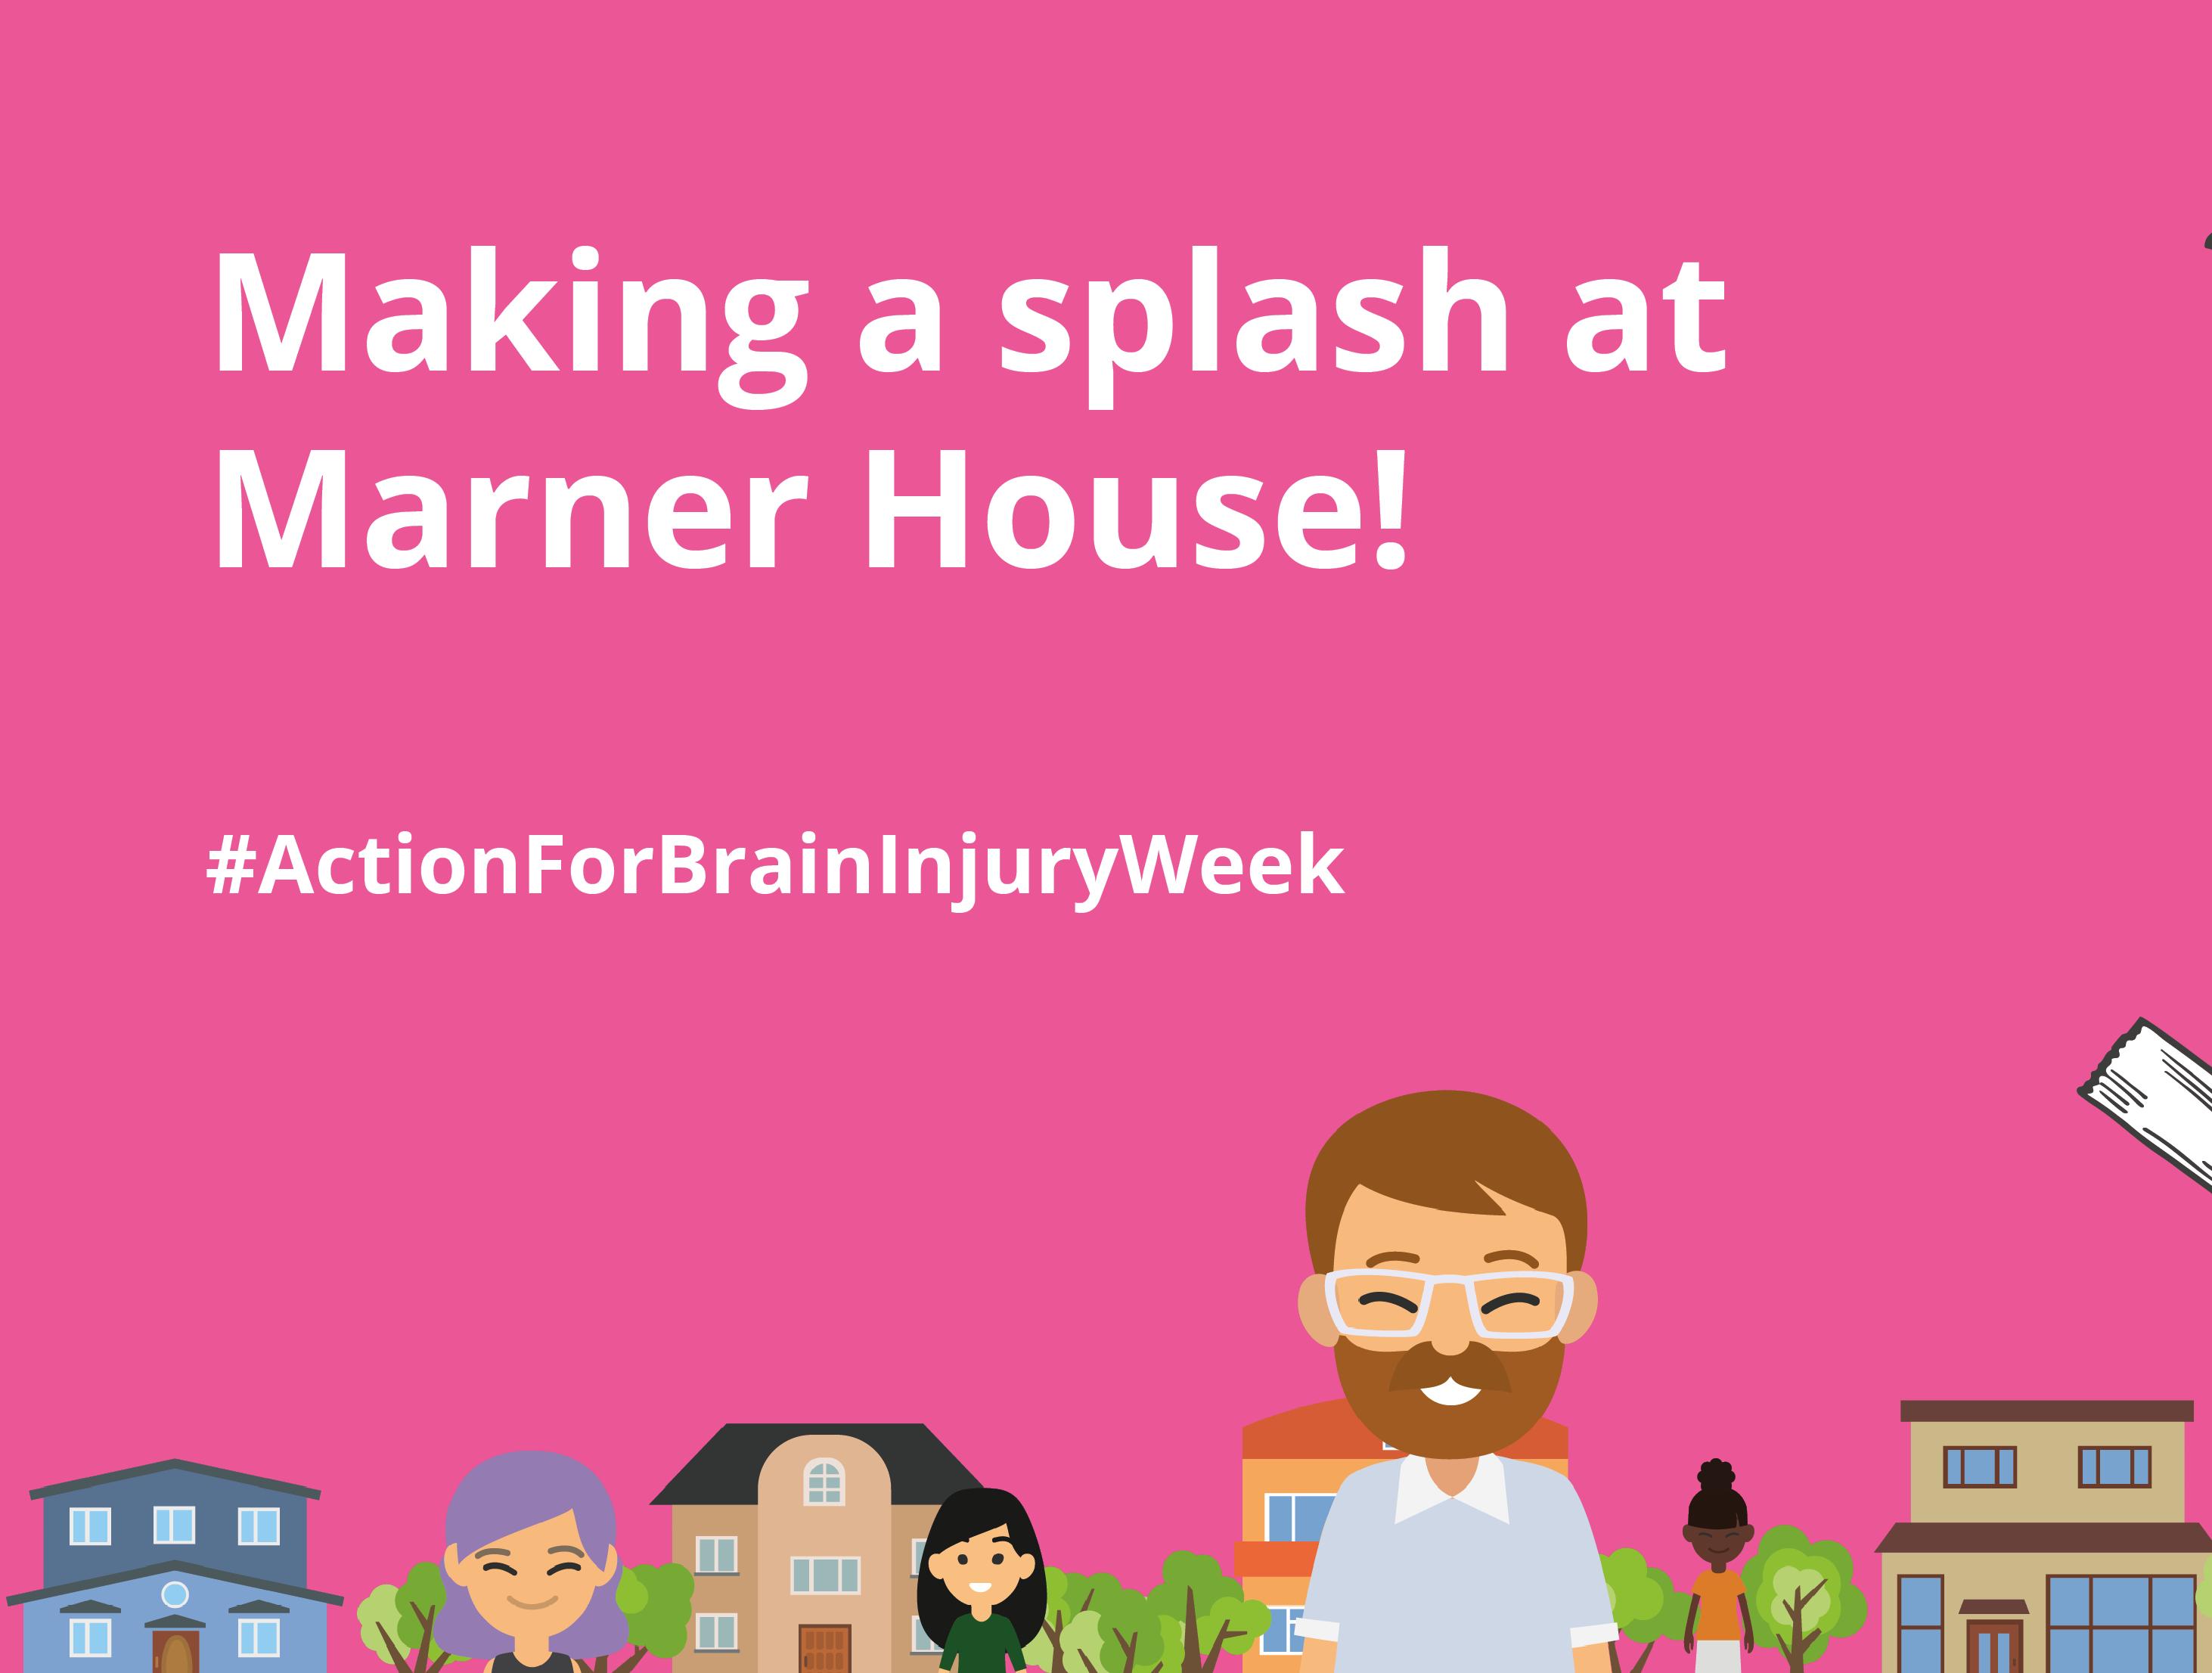 Making a splash at Marner House!